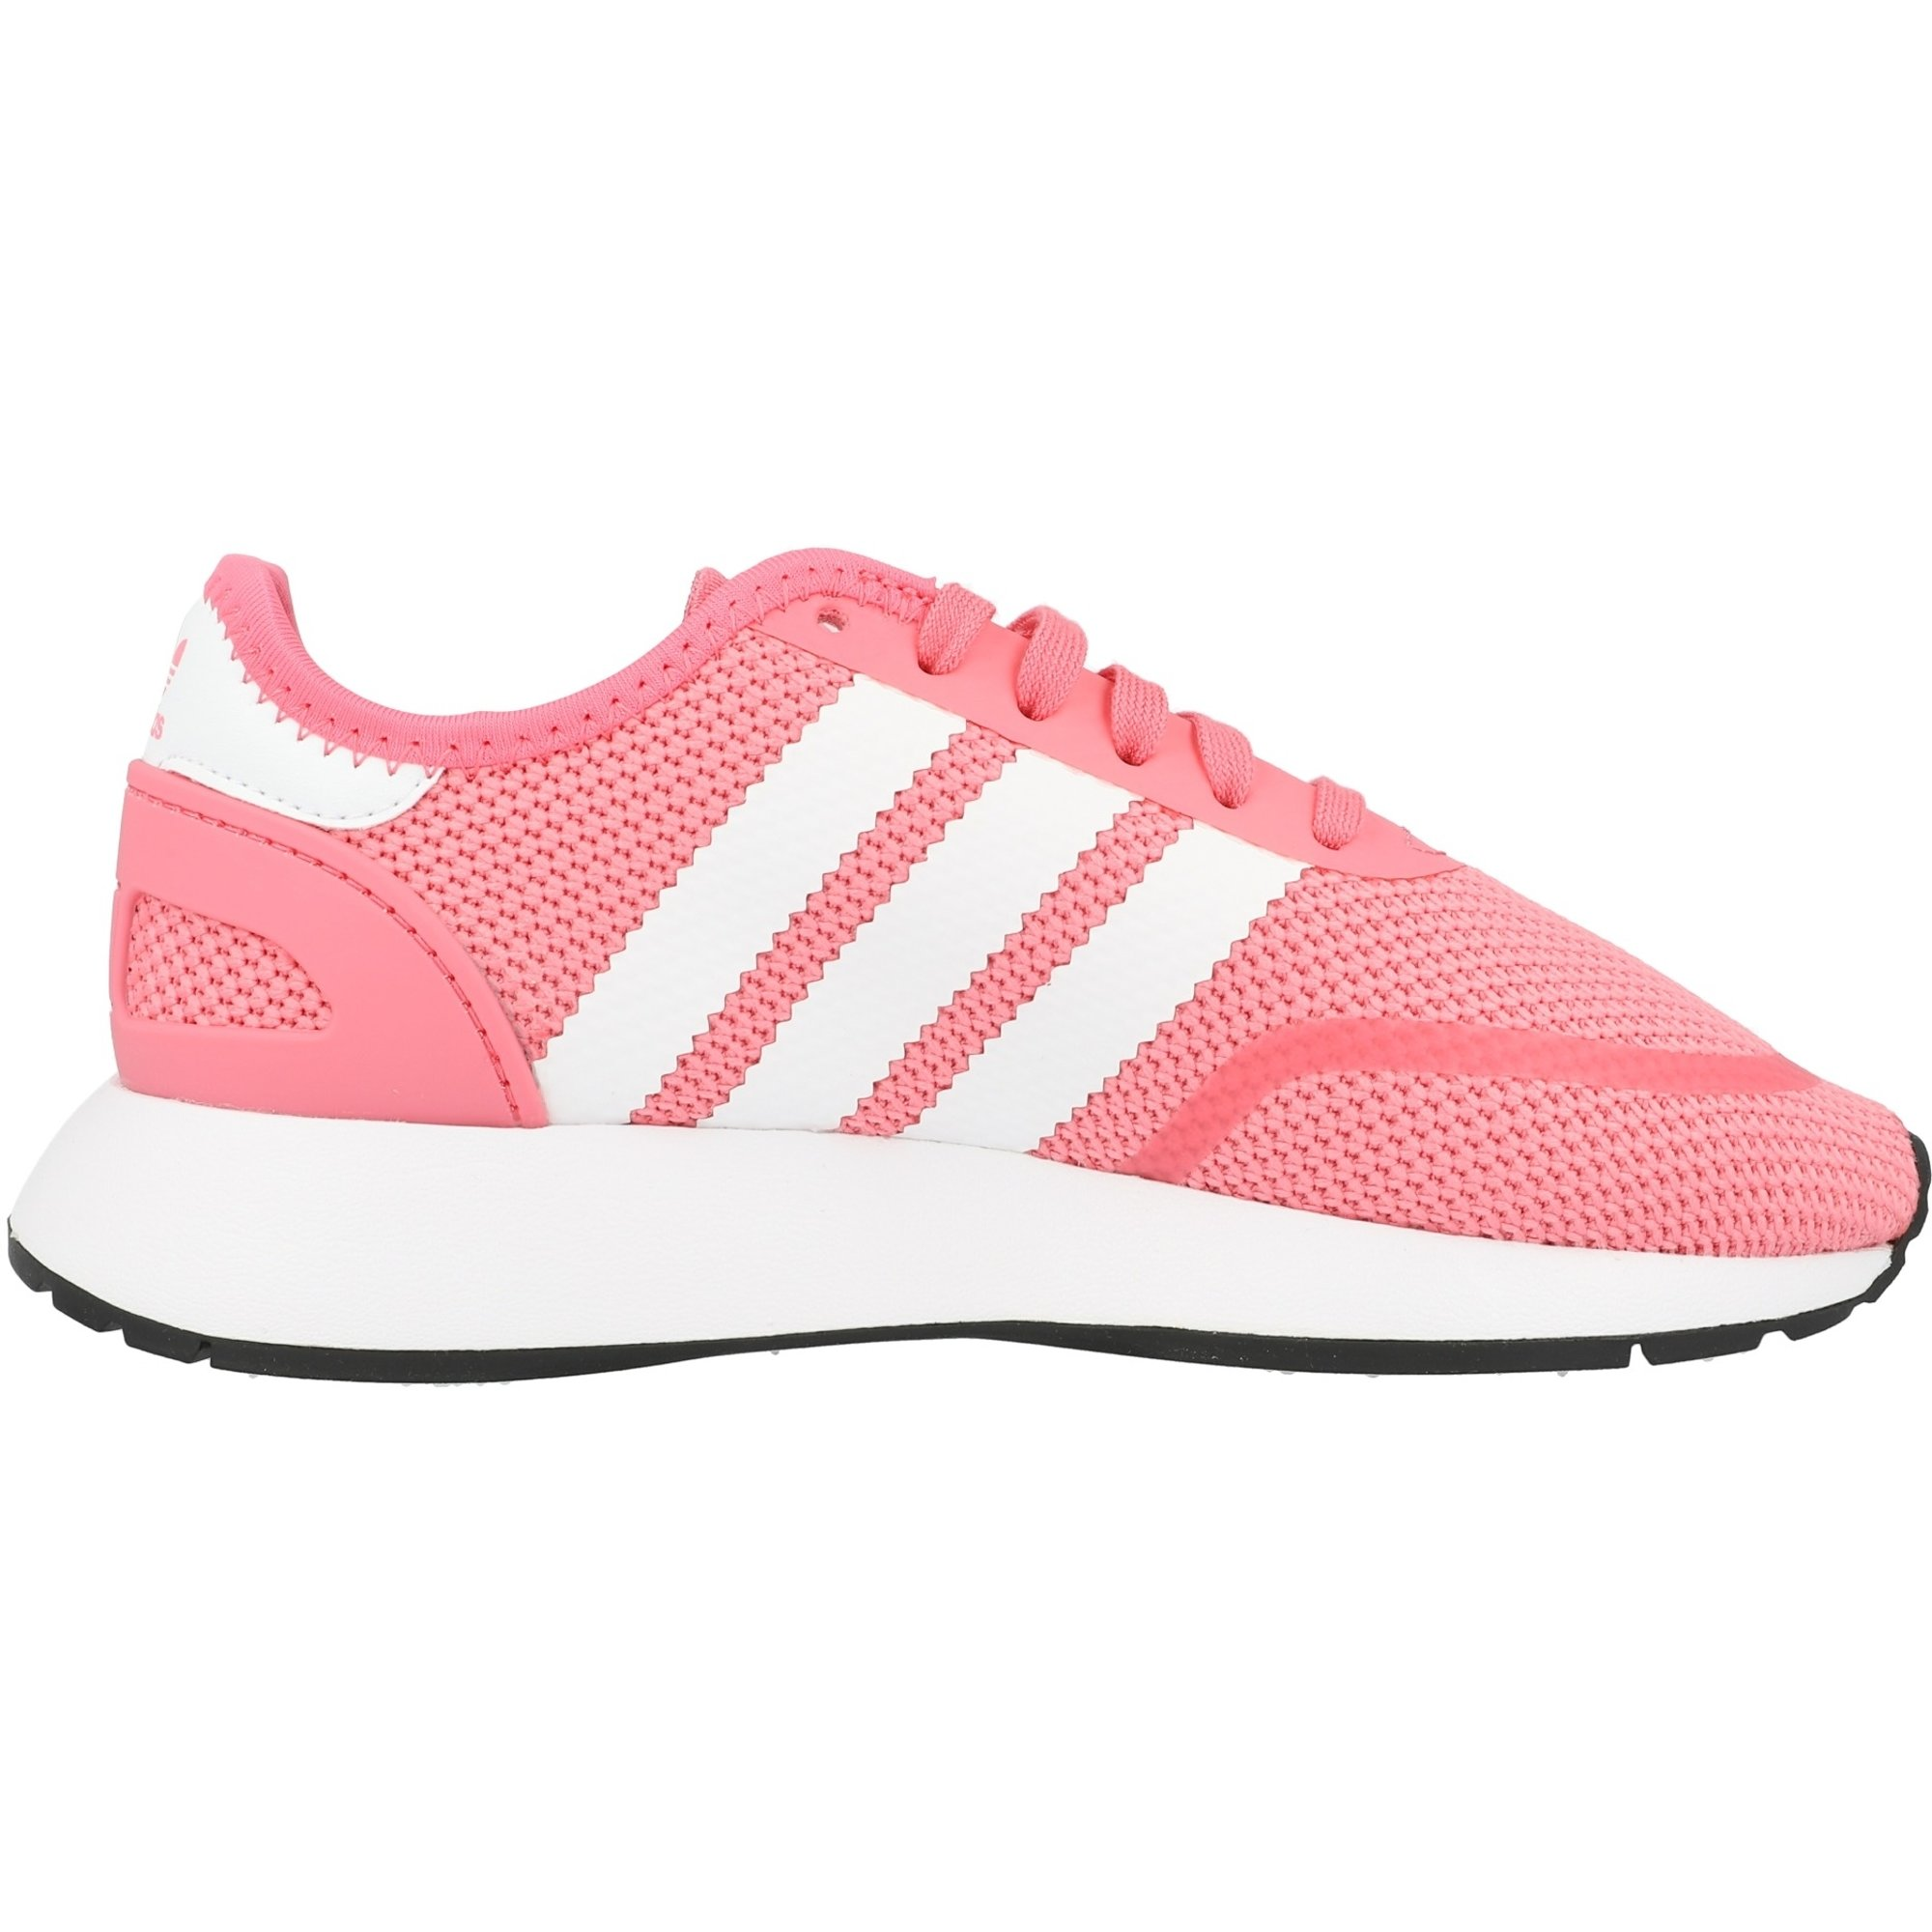 zapatos skechers 2018 new white original